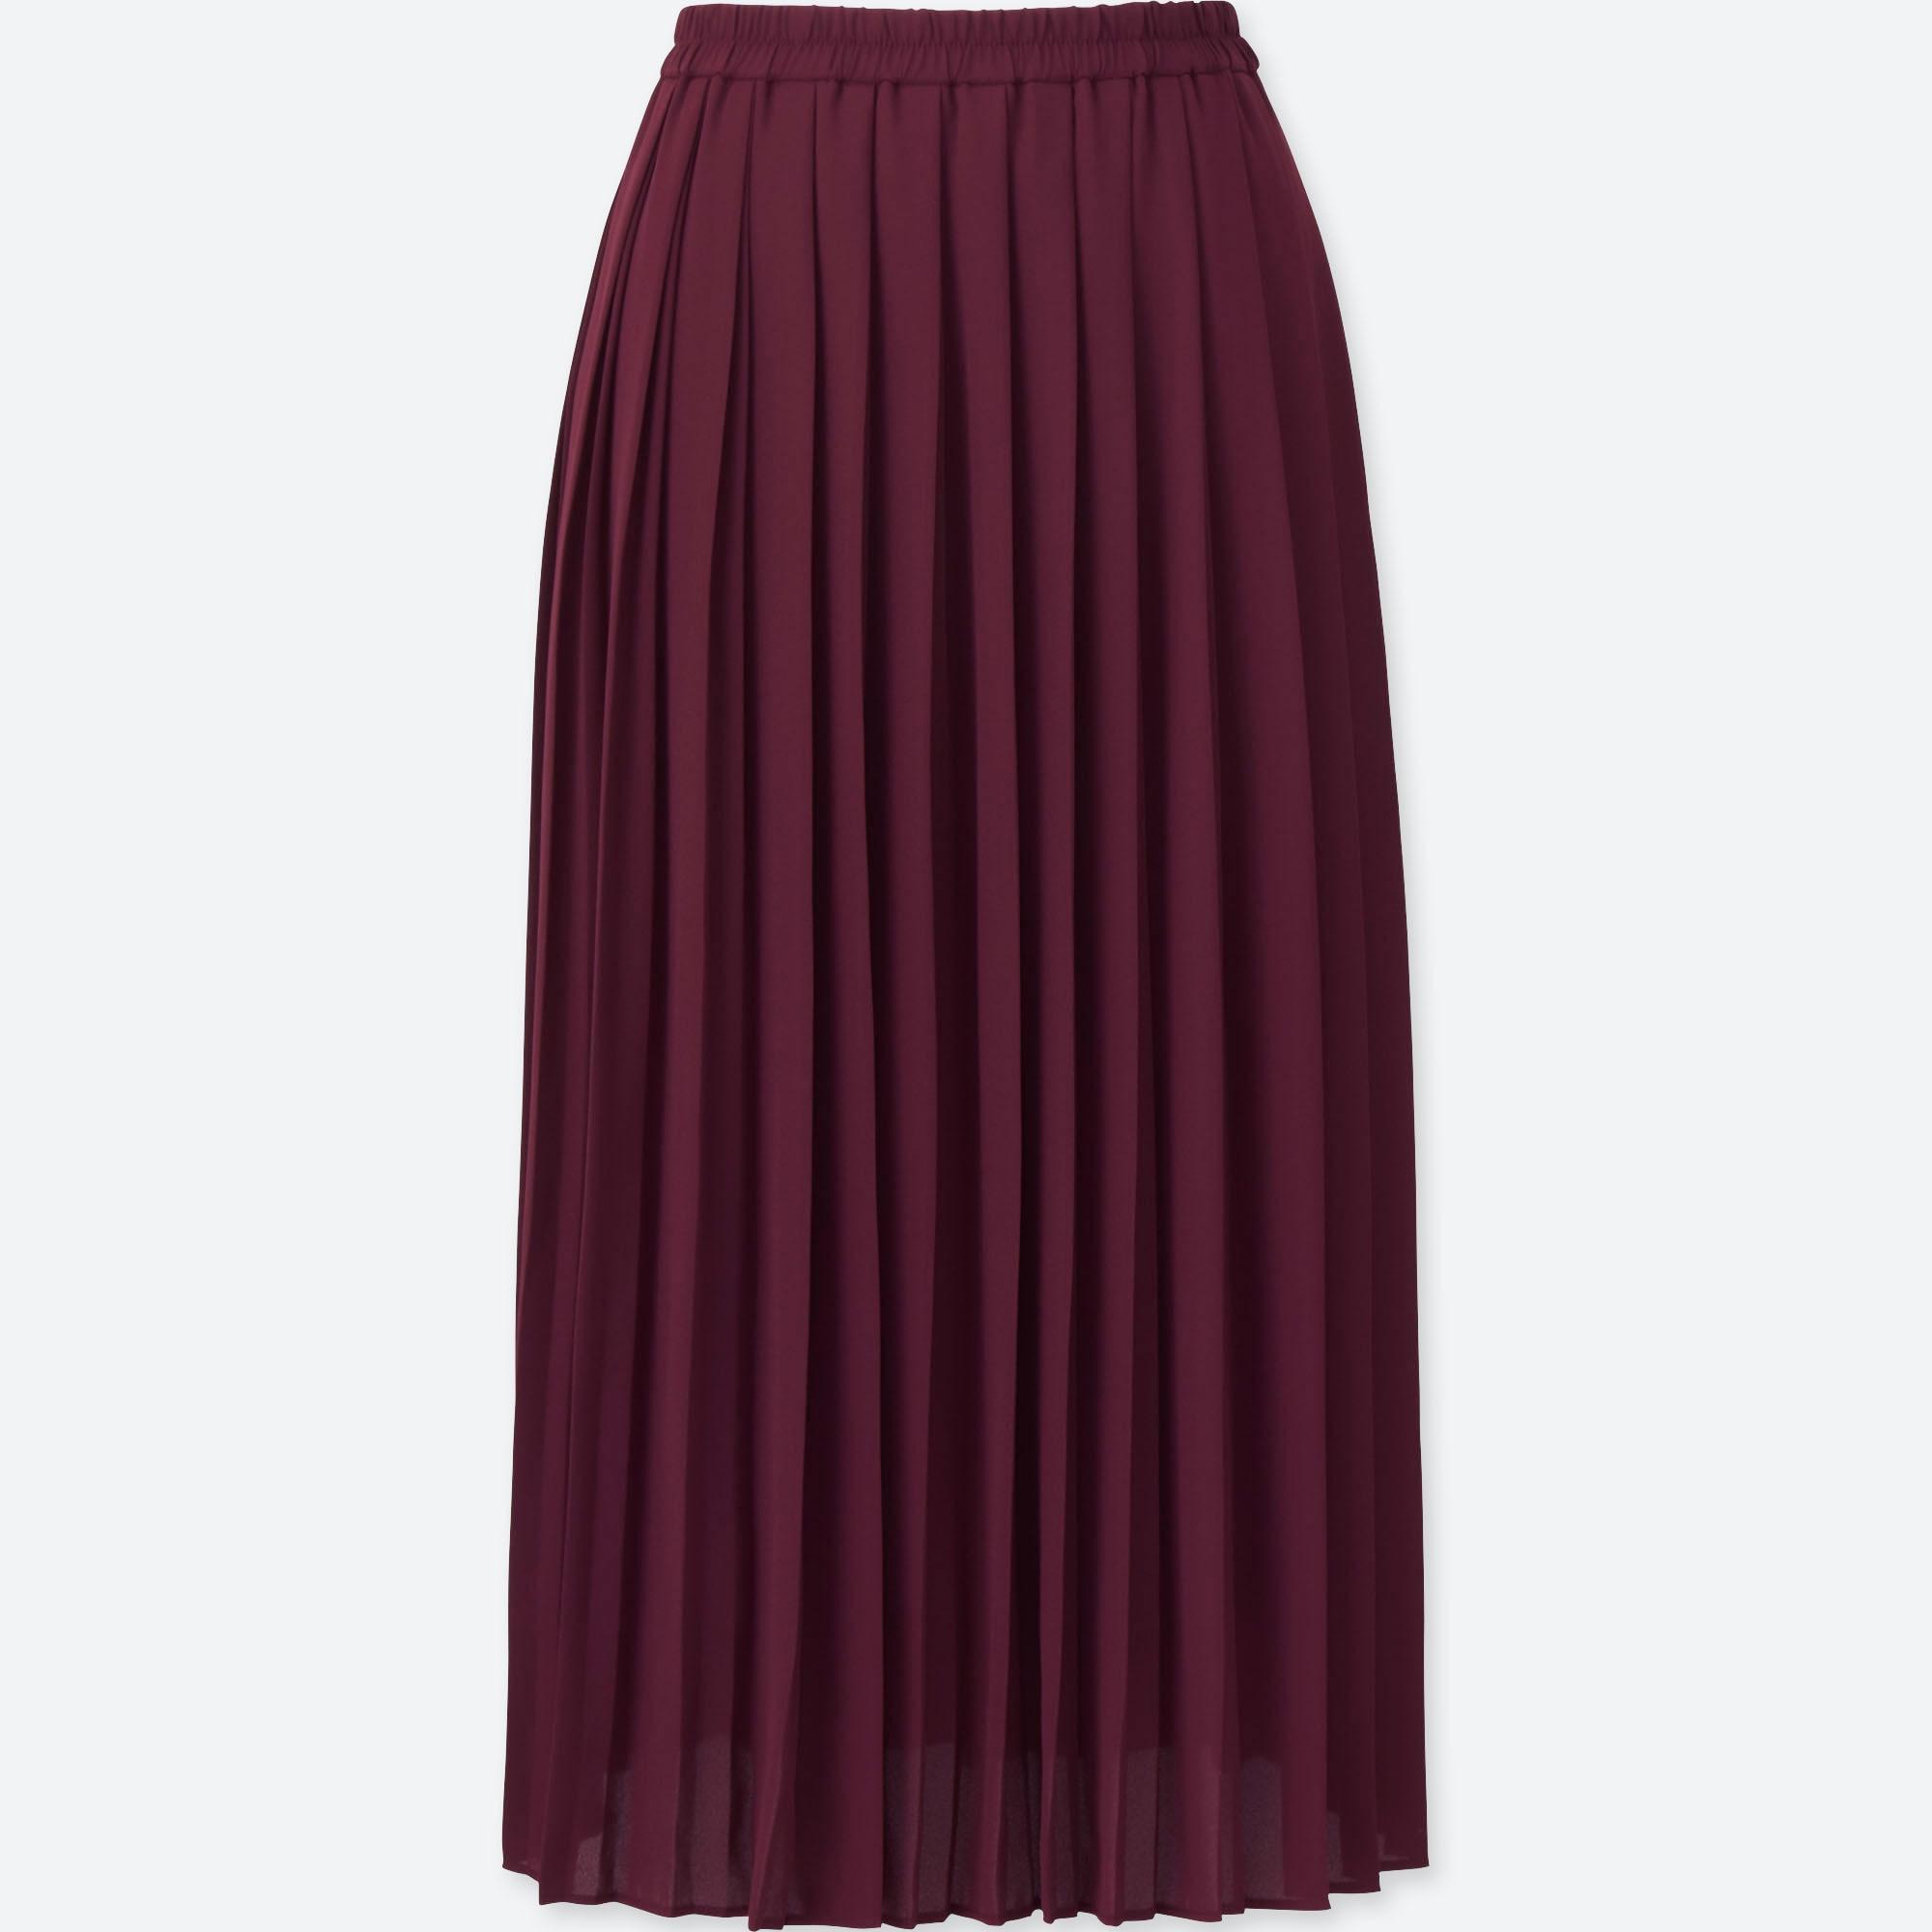 Women High Waist Chiffon Pleated Midi Skirt Uniqlo Us